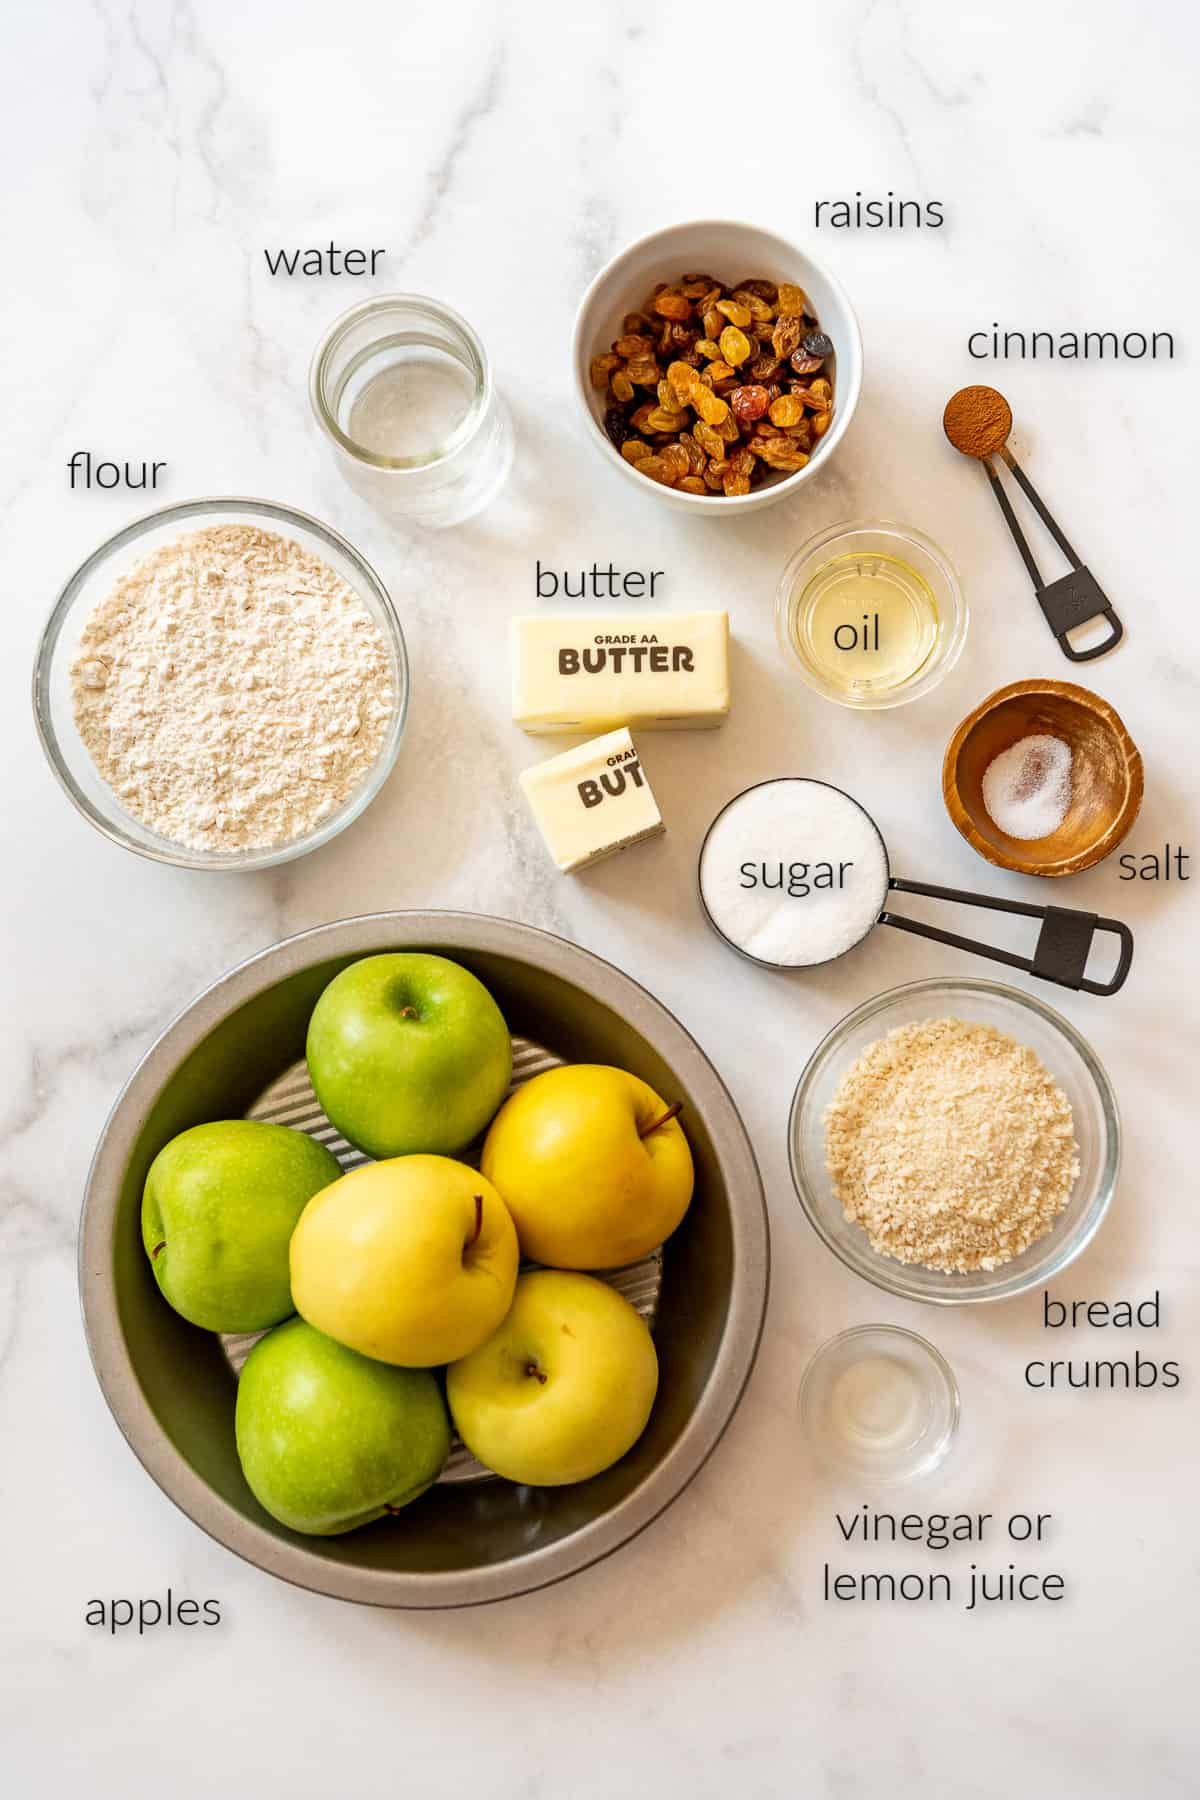 labeled ingredients for making apple strudel.